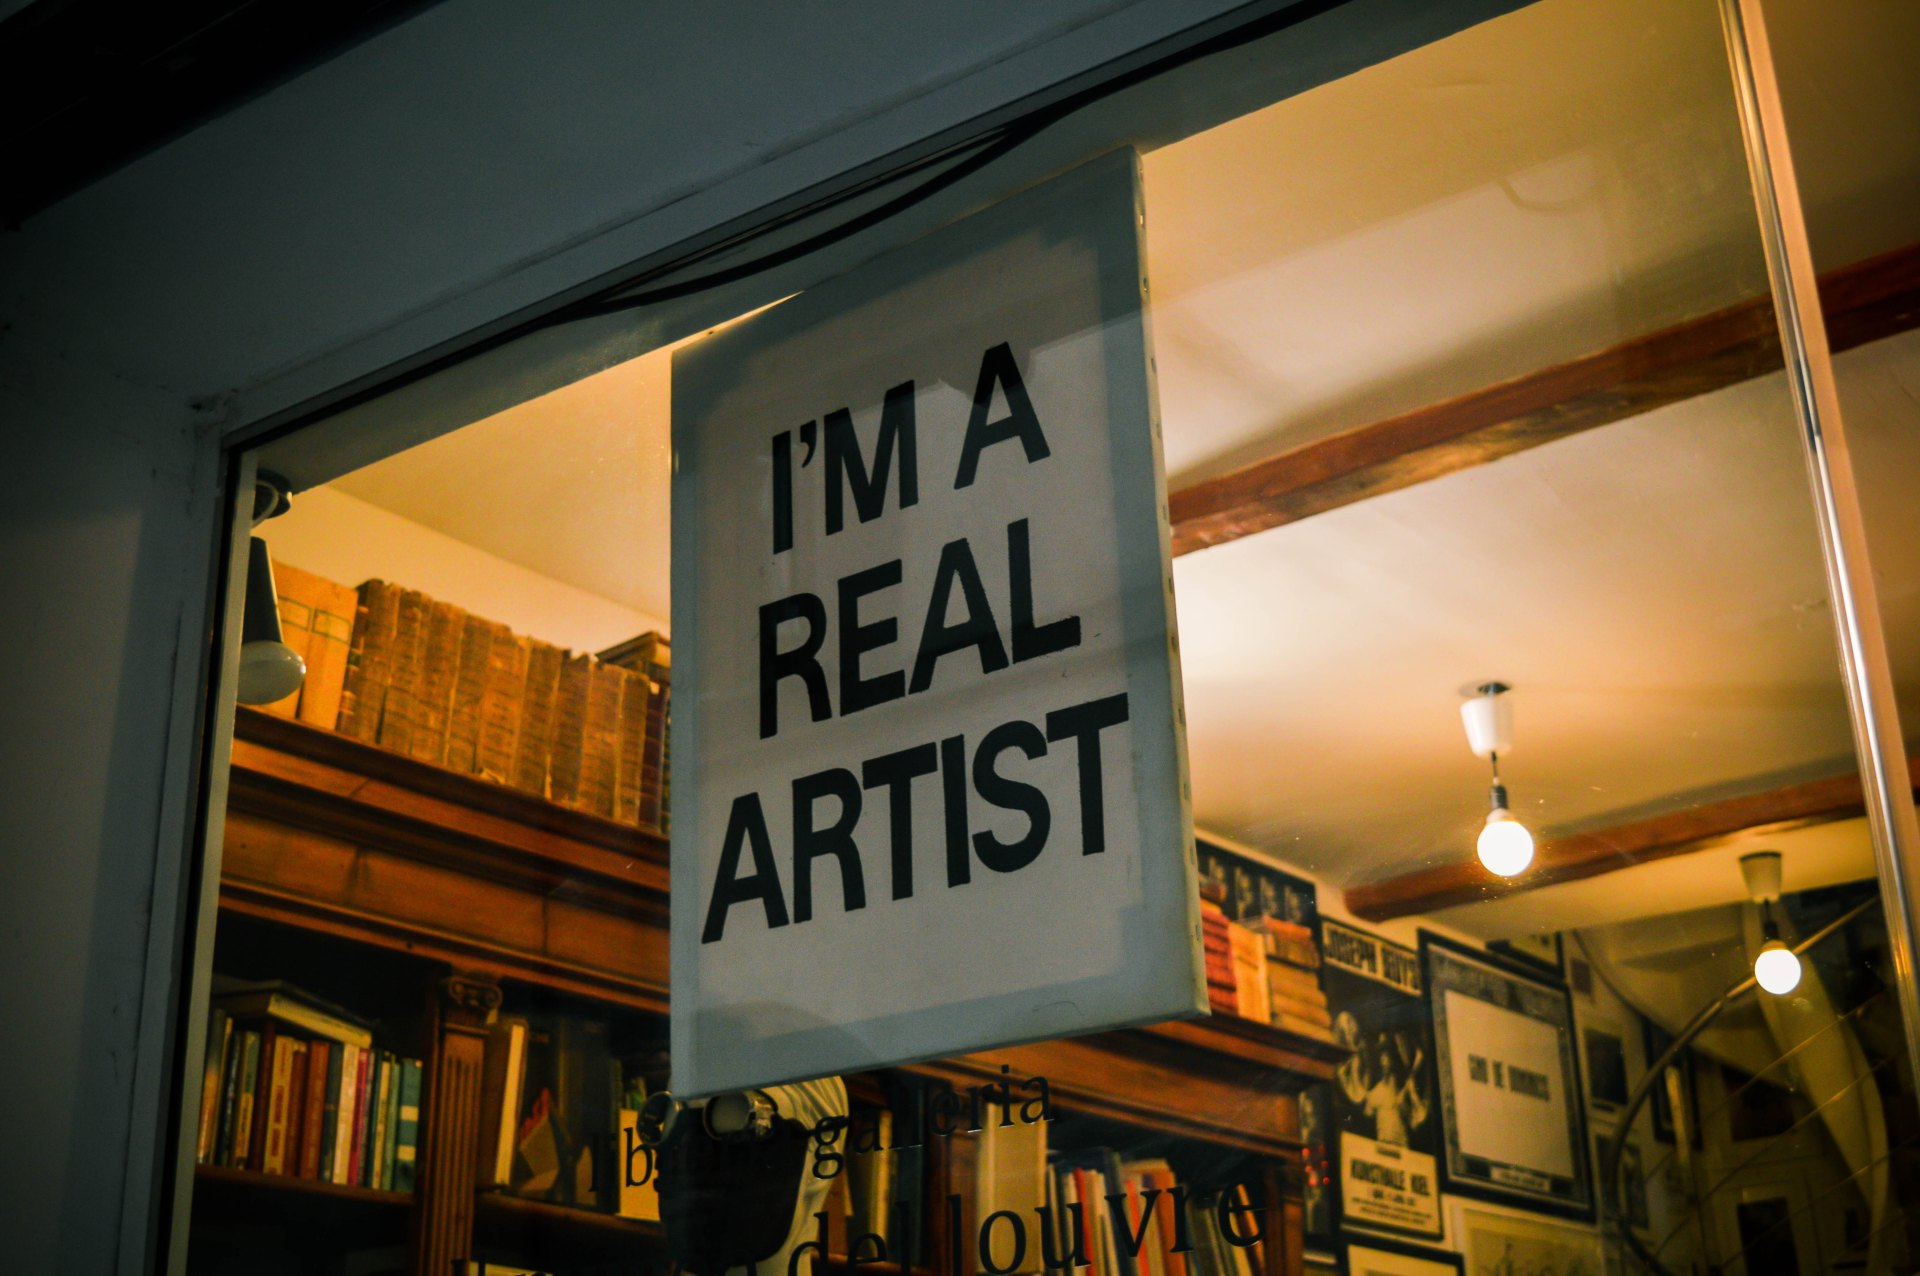 I am a real artist